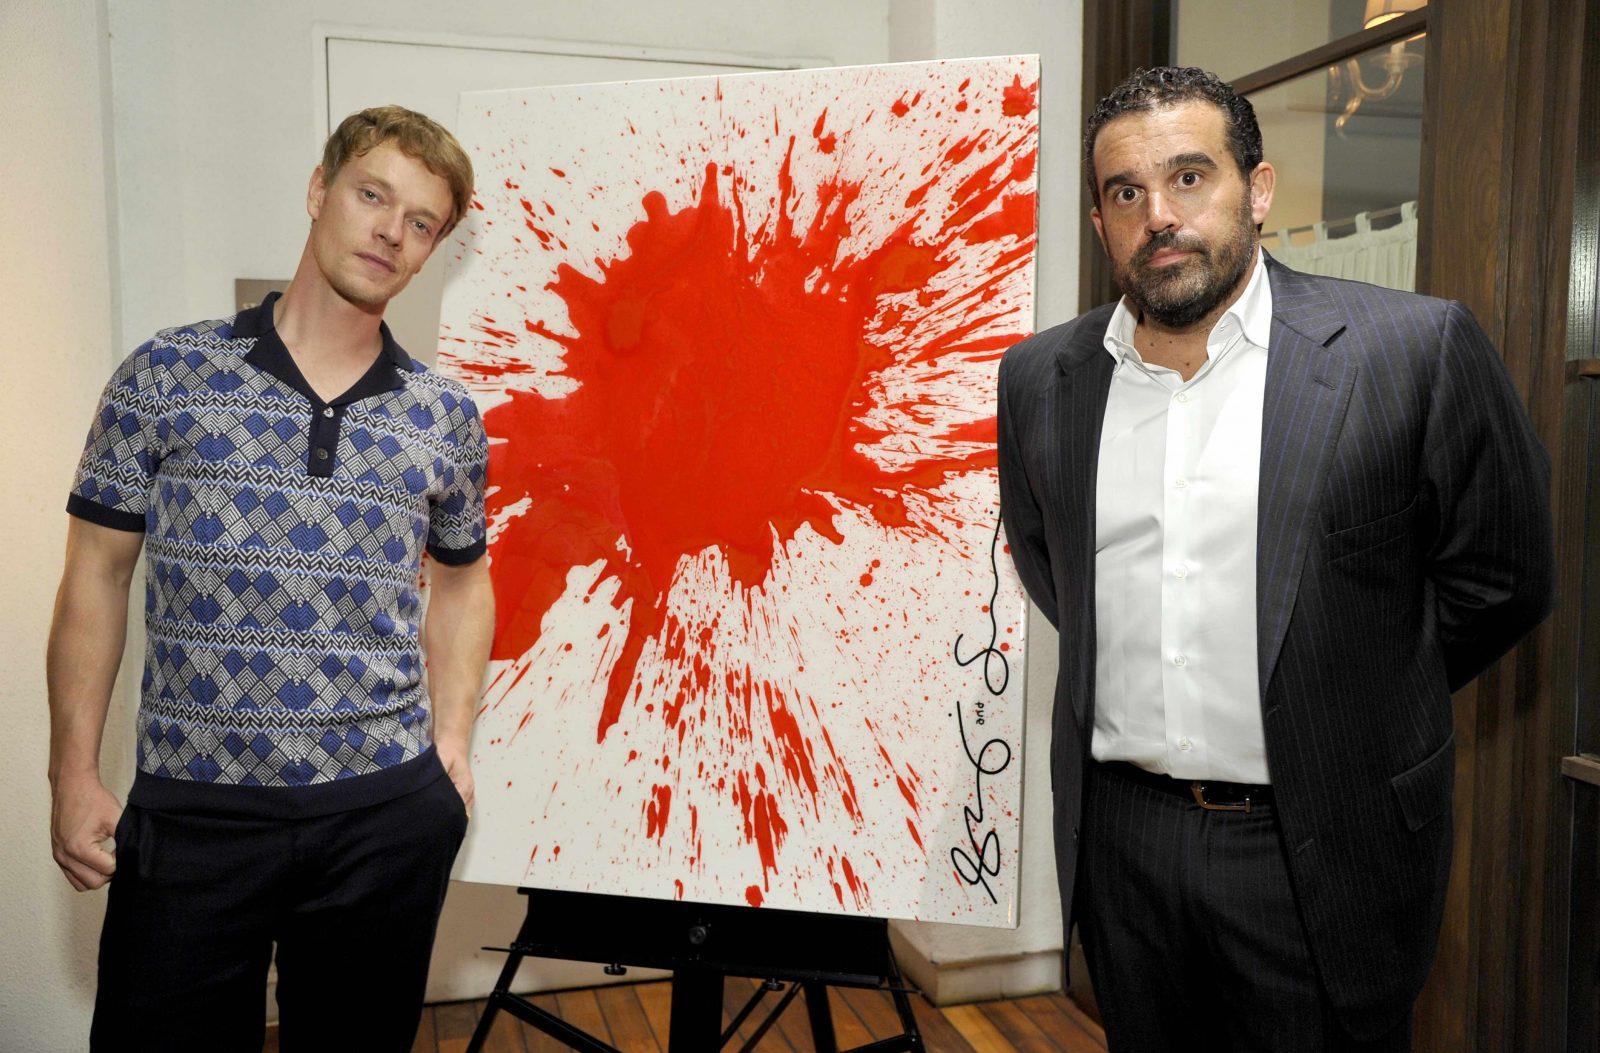 Alfie Allen and Seth Semilof